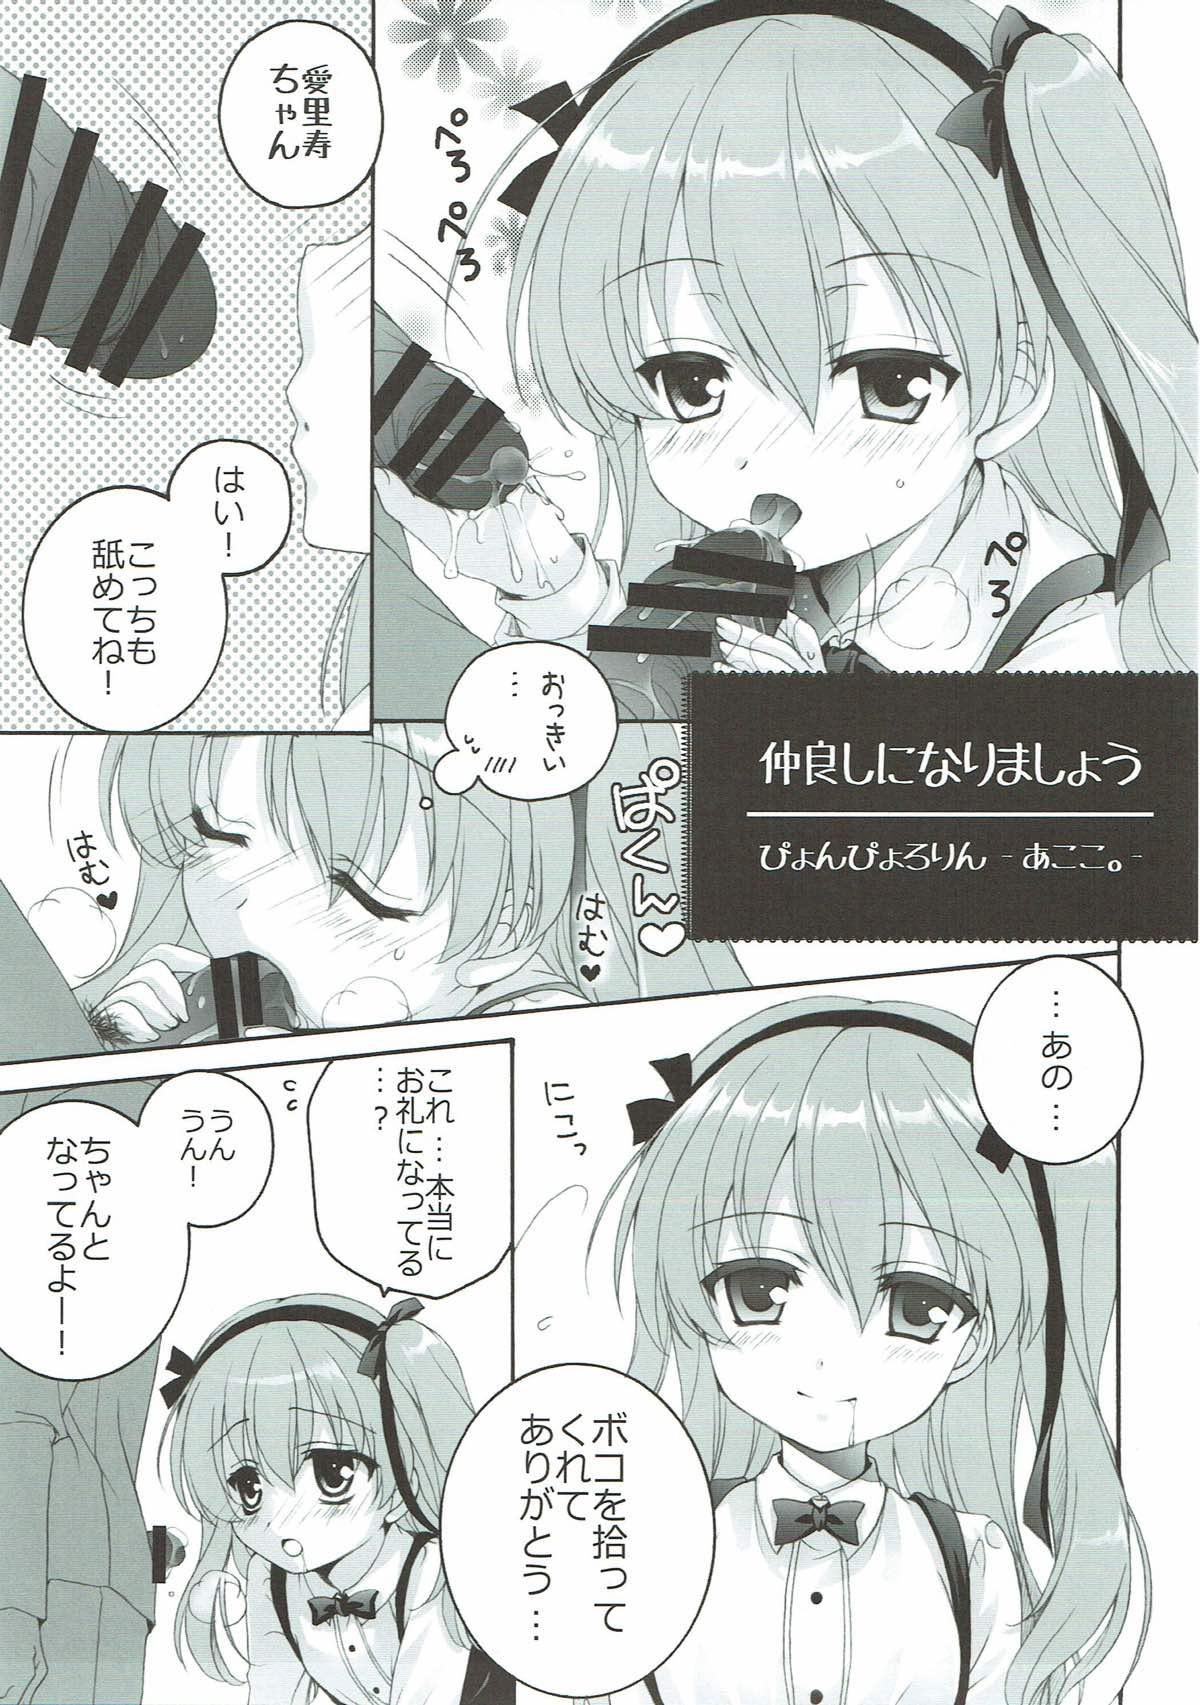 THE Senshoujo 3 15